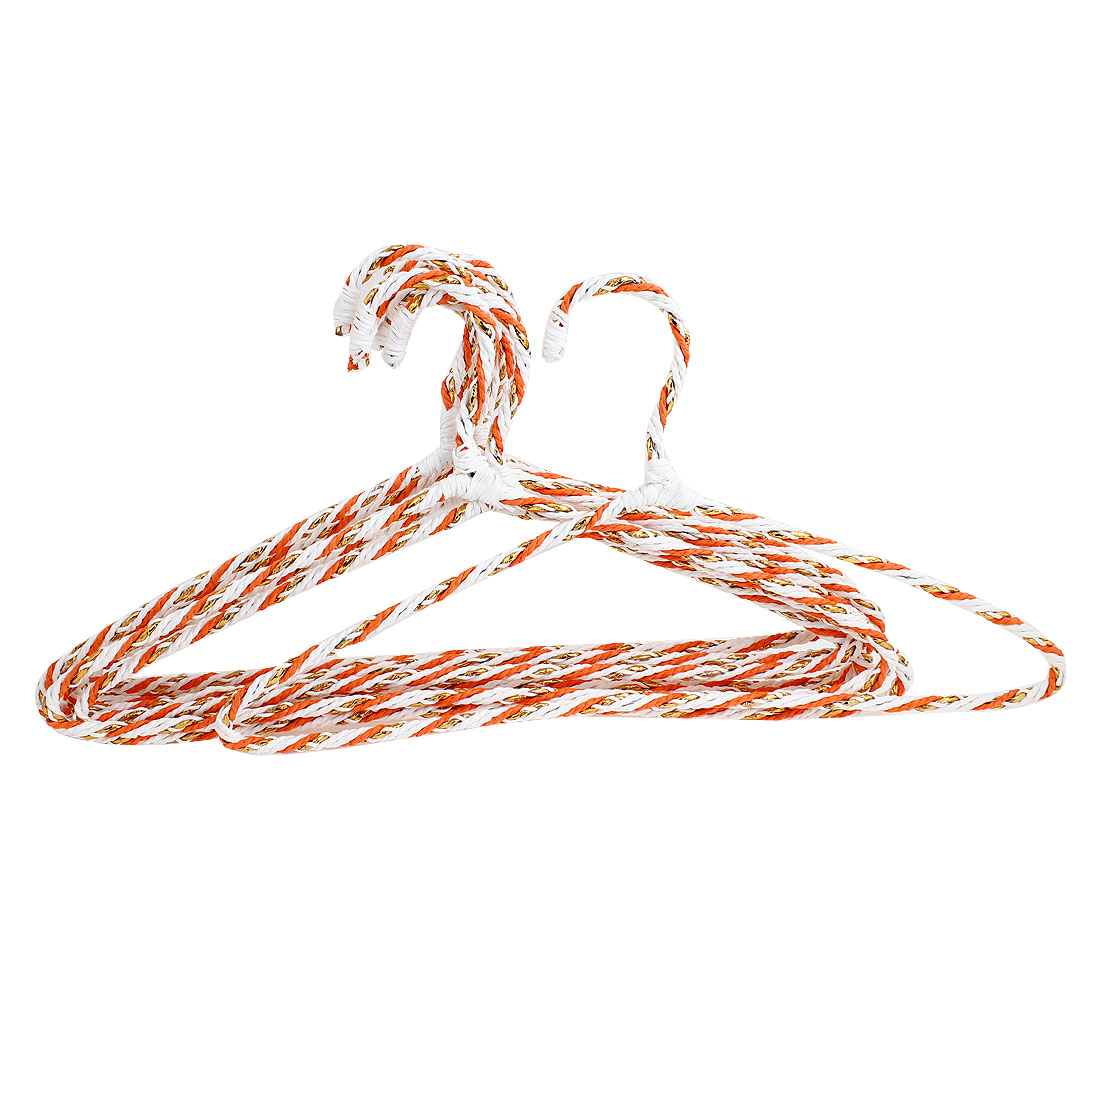 Nylon Wrapped Metal Hook Orange White Metal Braided Design Coats Hangers 10PCS